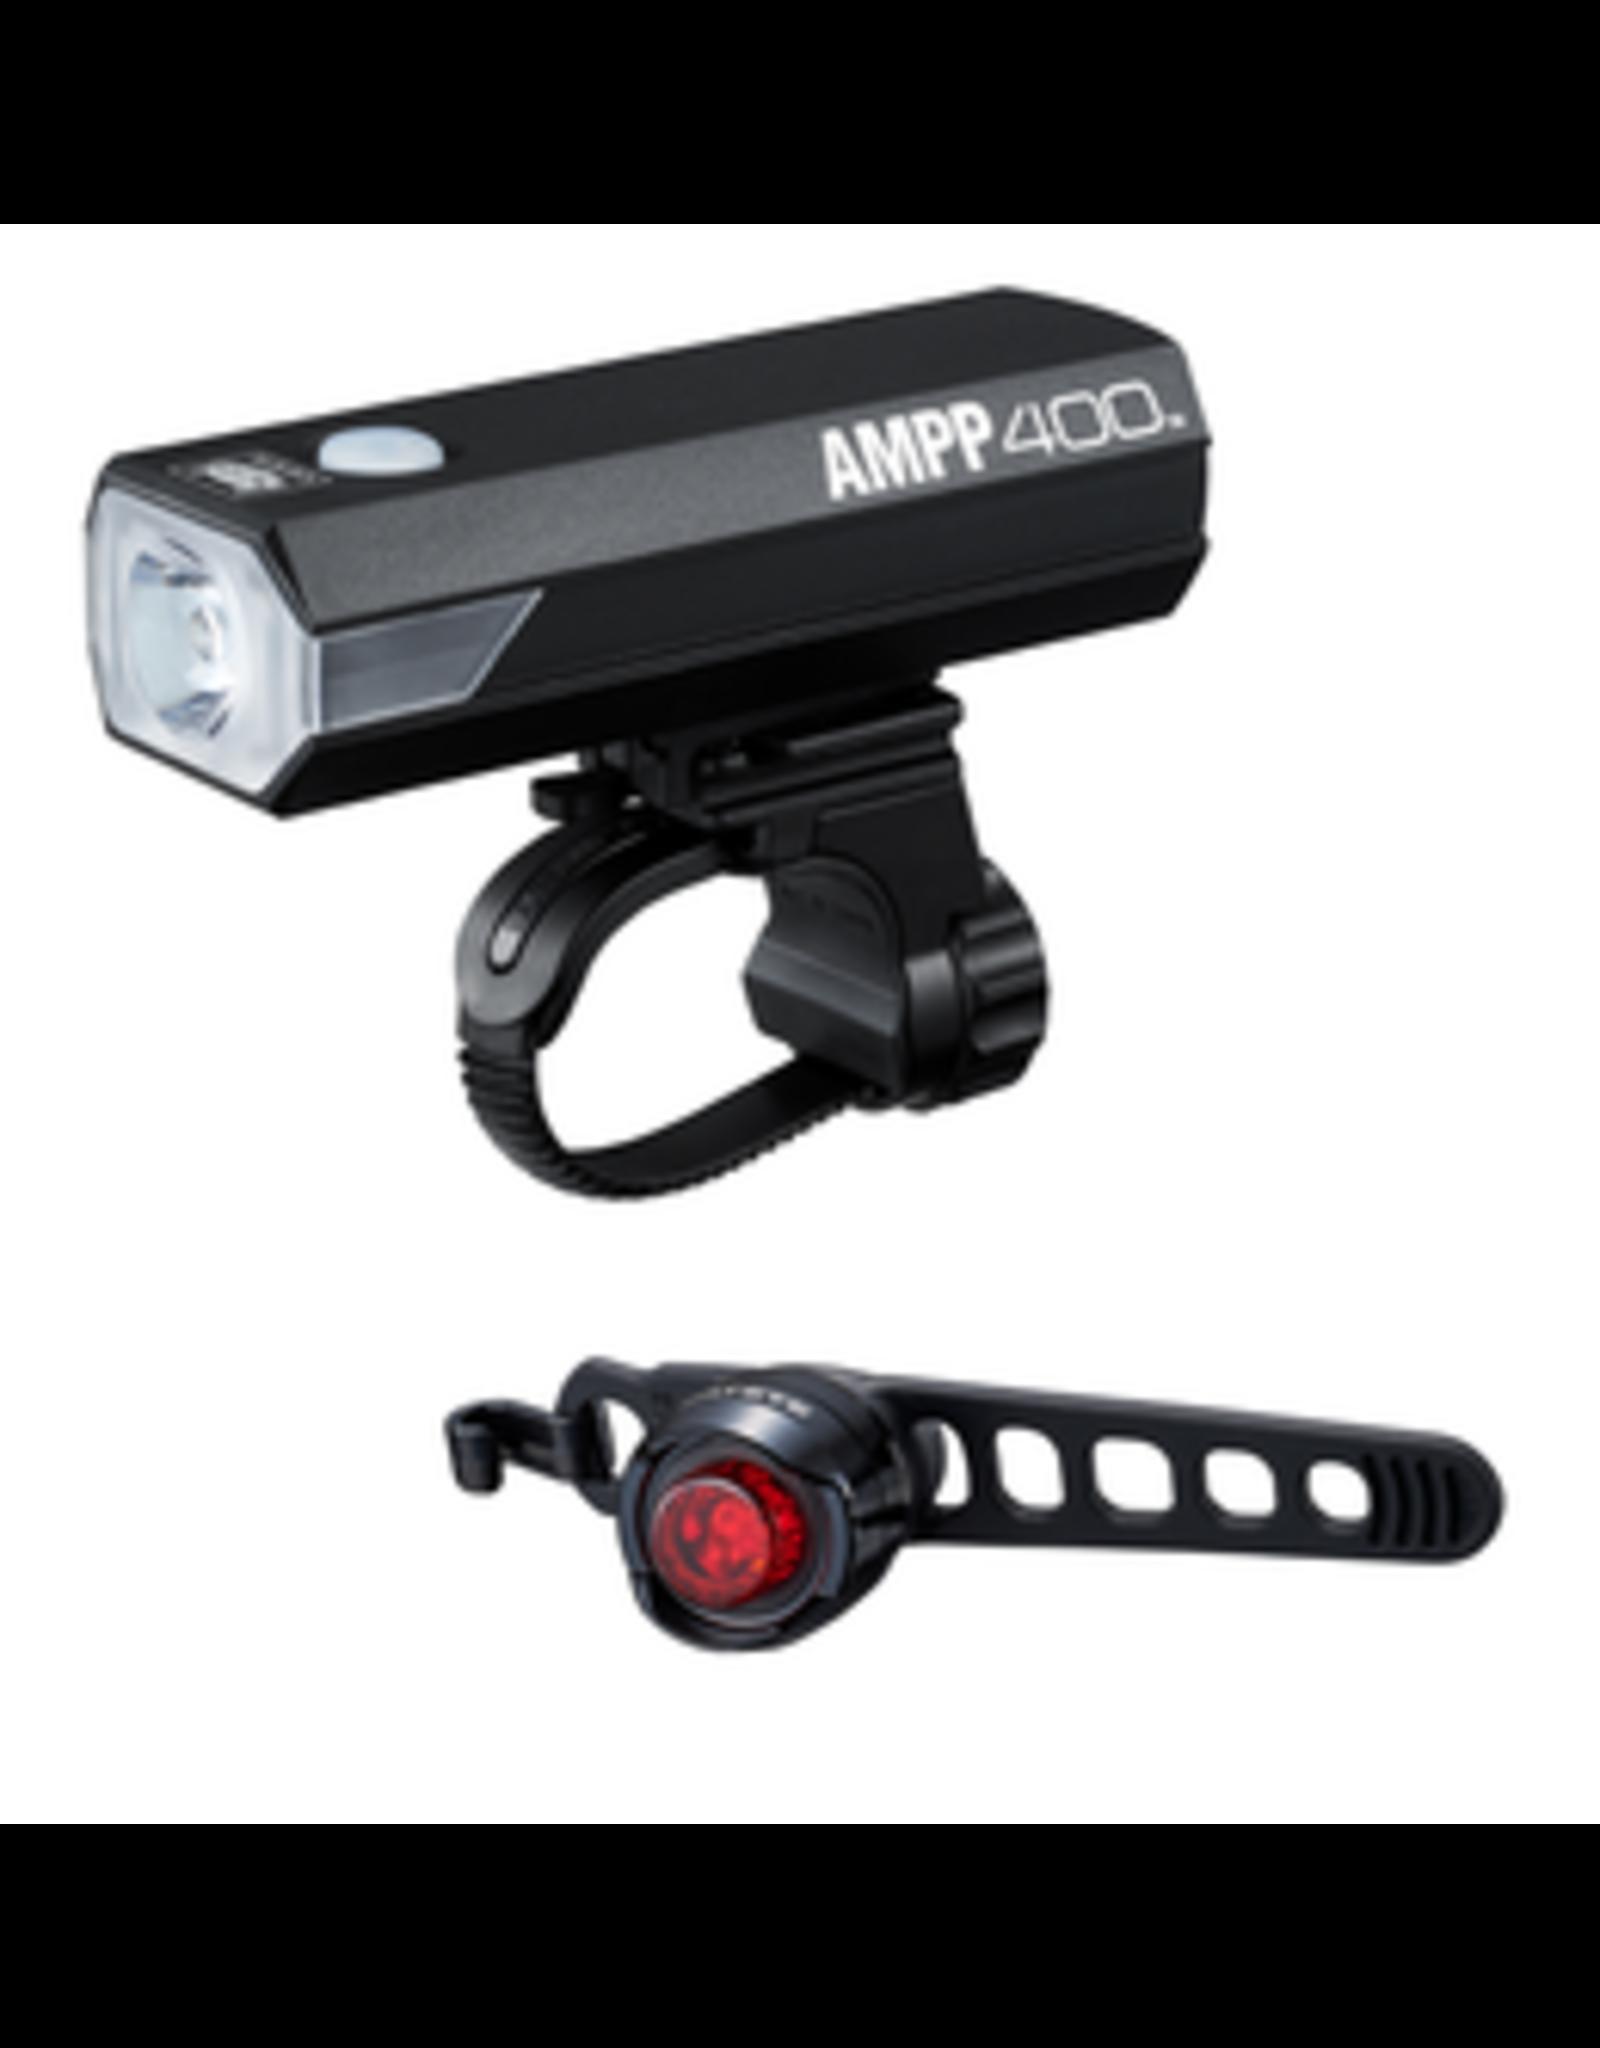 CatEye CTY LIGHTSET AMPP 400 & ORB RC